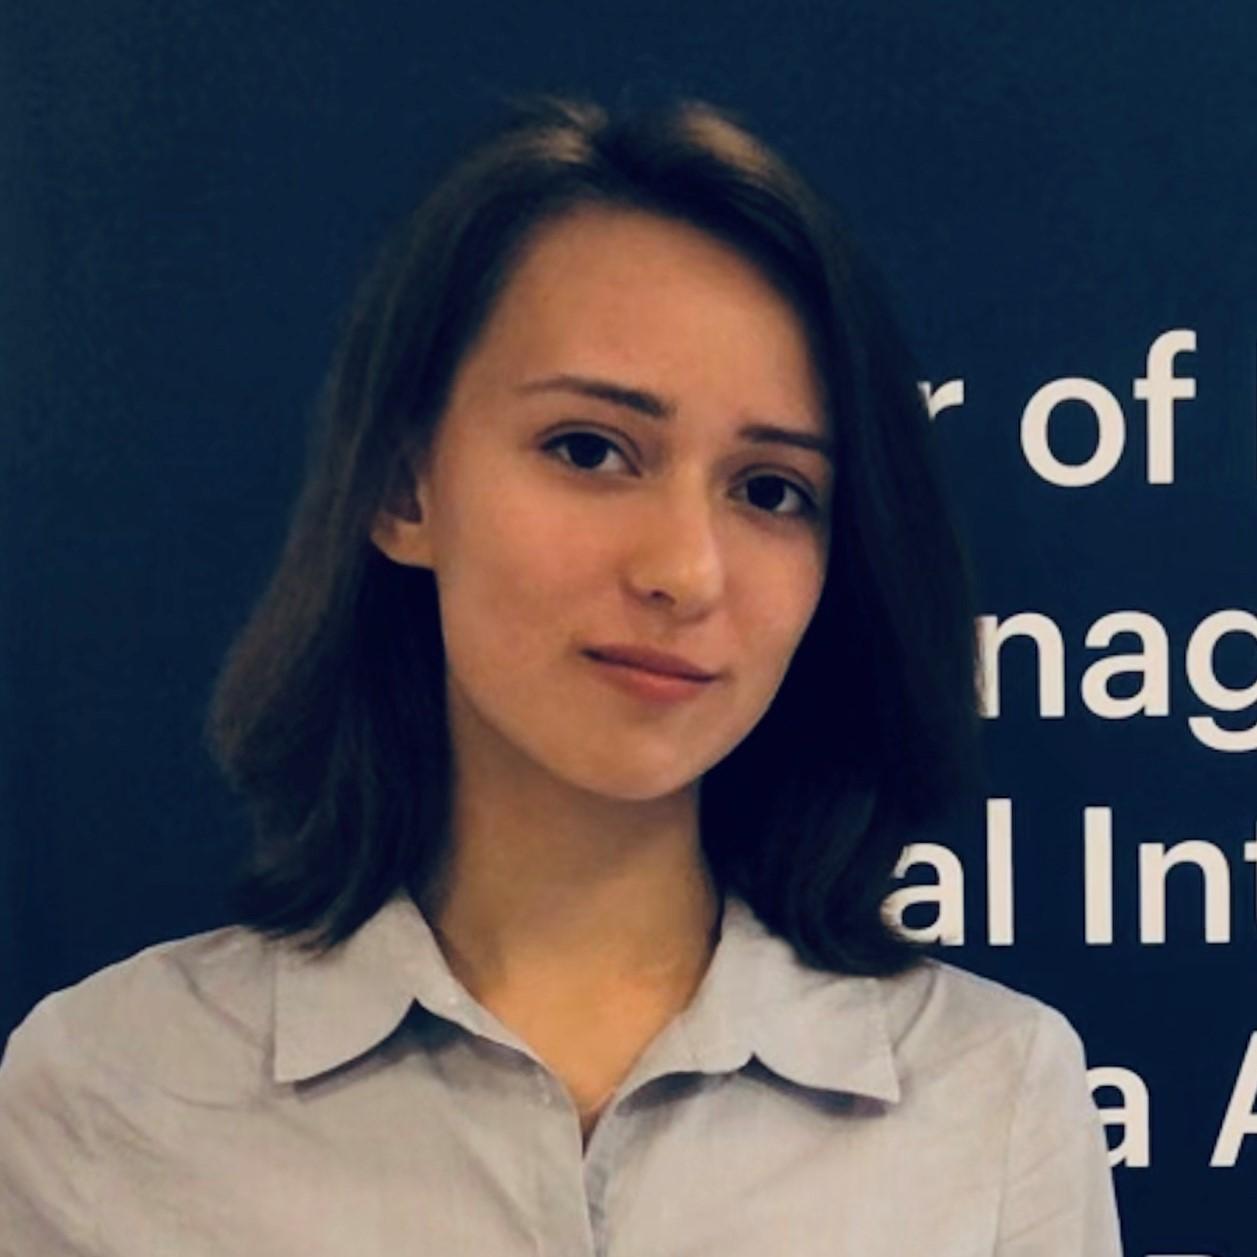 Alina Skorokhodova